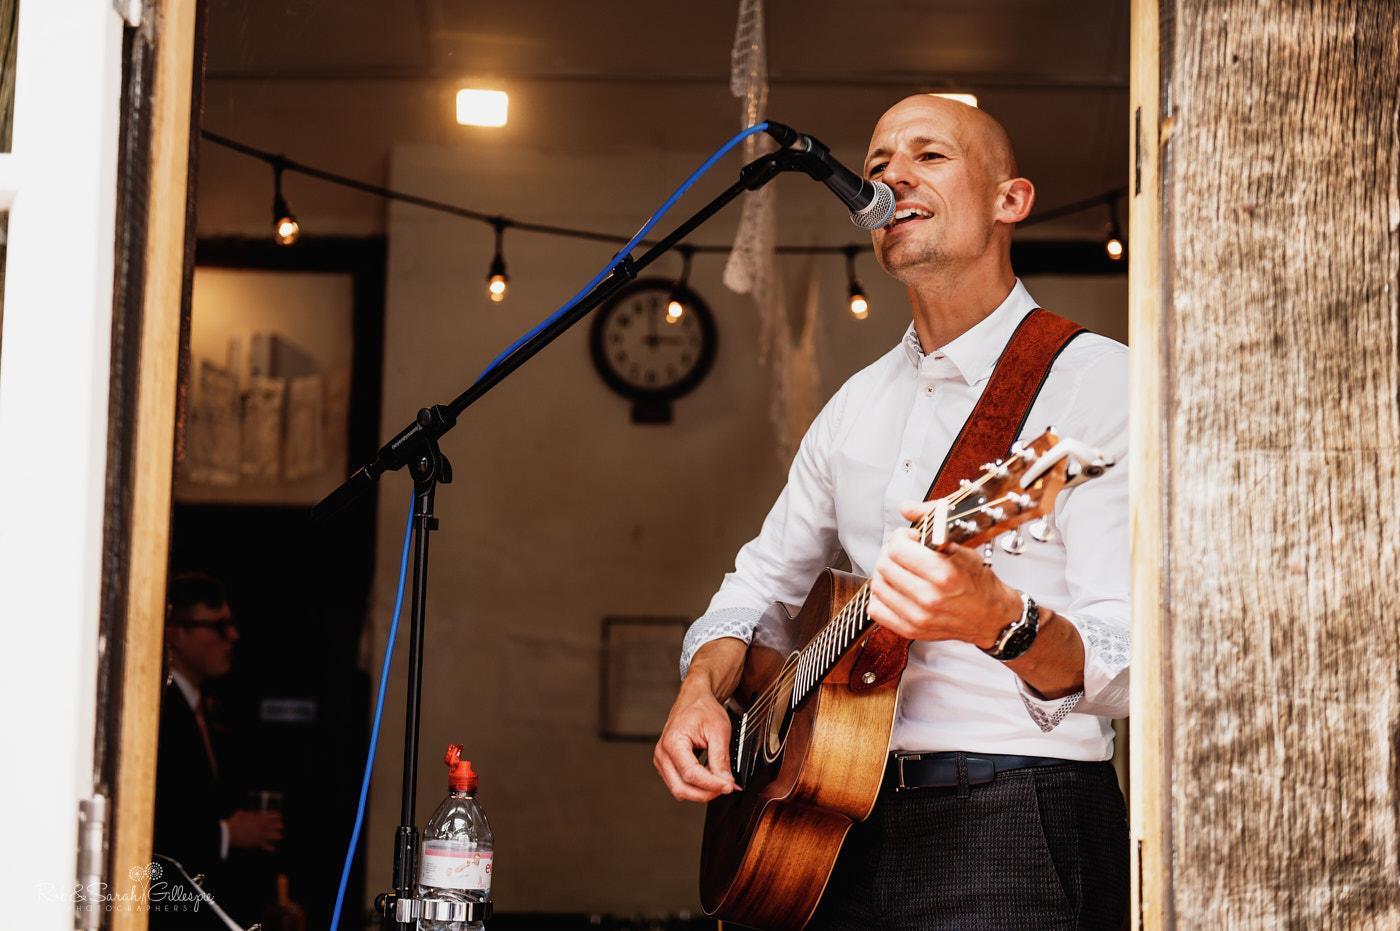 Musician plays at wedding reception at Belbroughton village hall